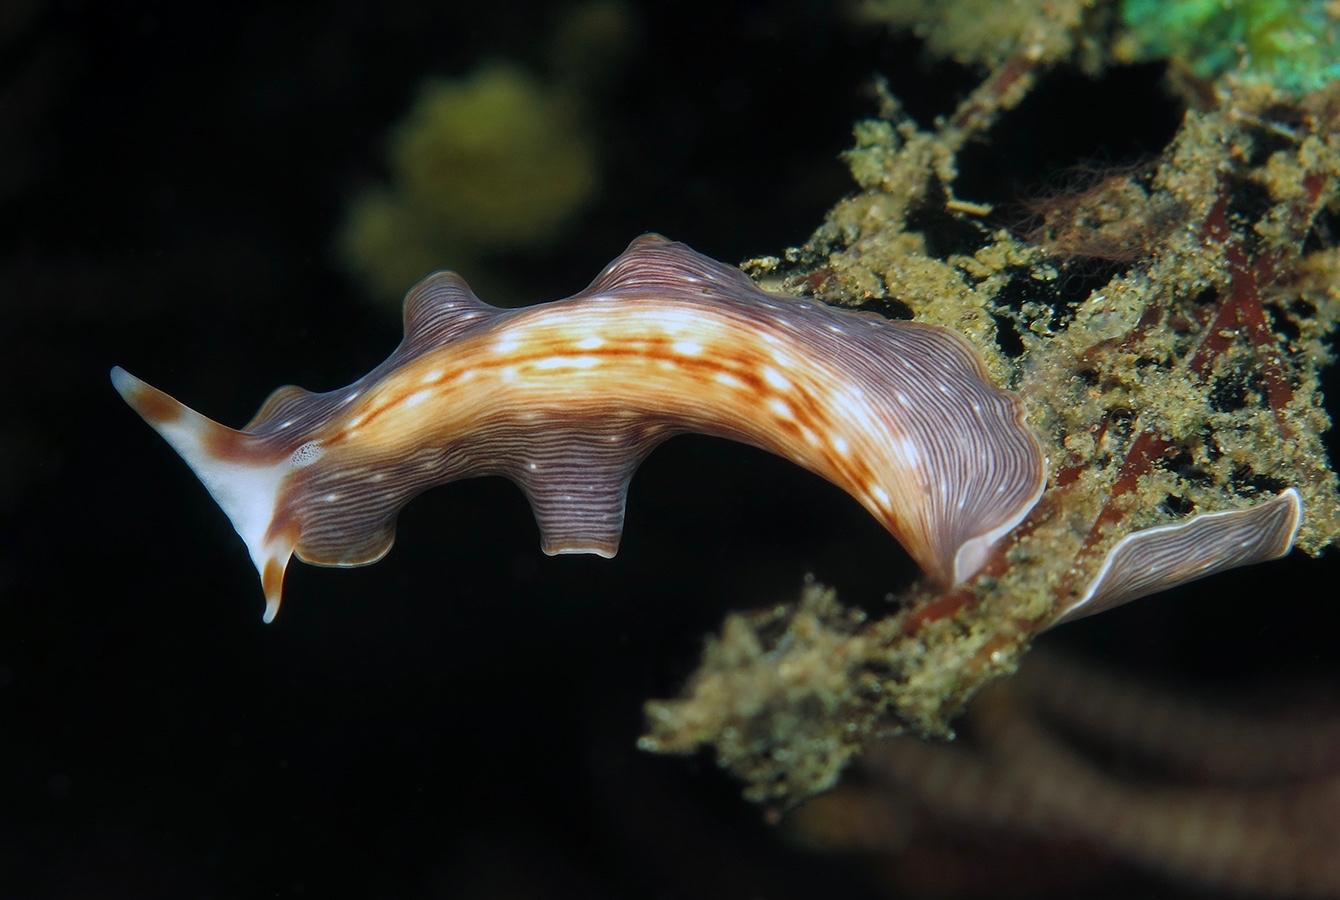 Prostheceraeus sp   条纹扁虫(Striped Flatworm)  巴厘岛图蓝本 Tulamben 印度尼西亚 Indonesia @lazydiving.com 潜水时光